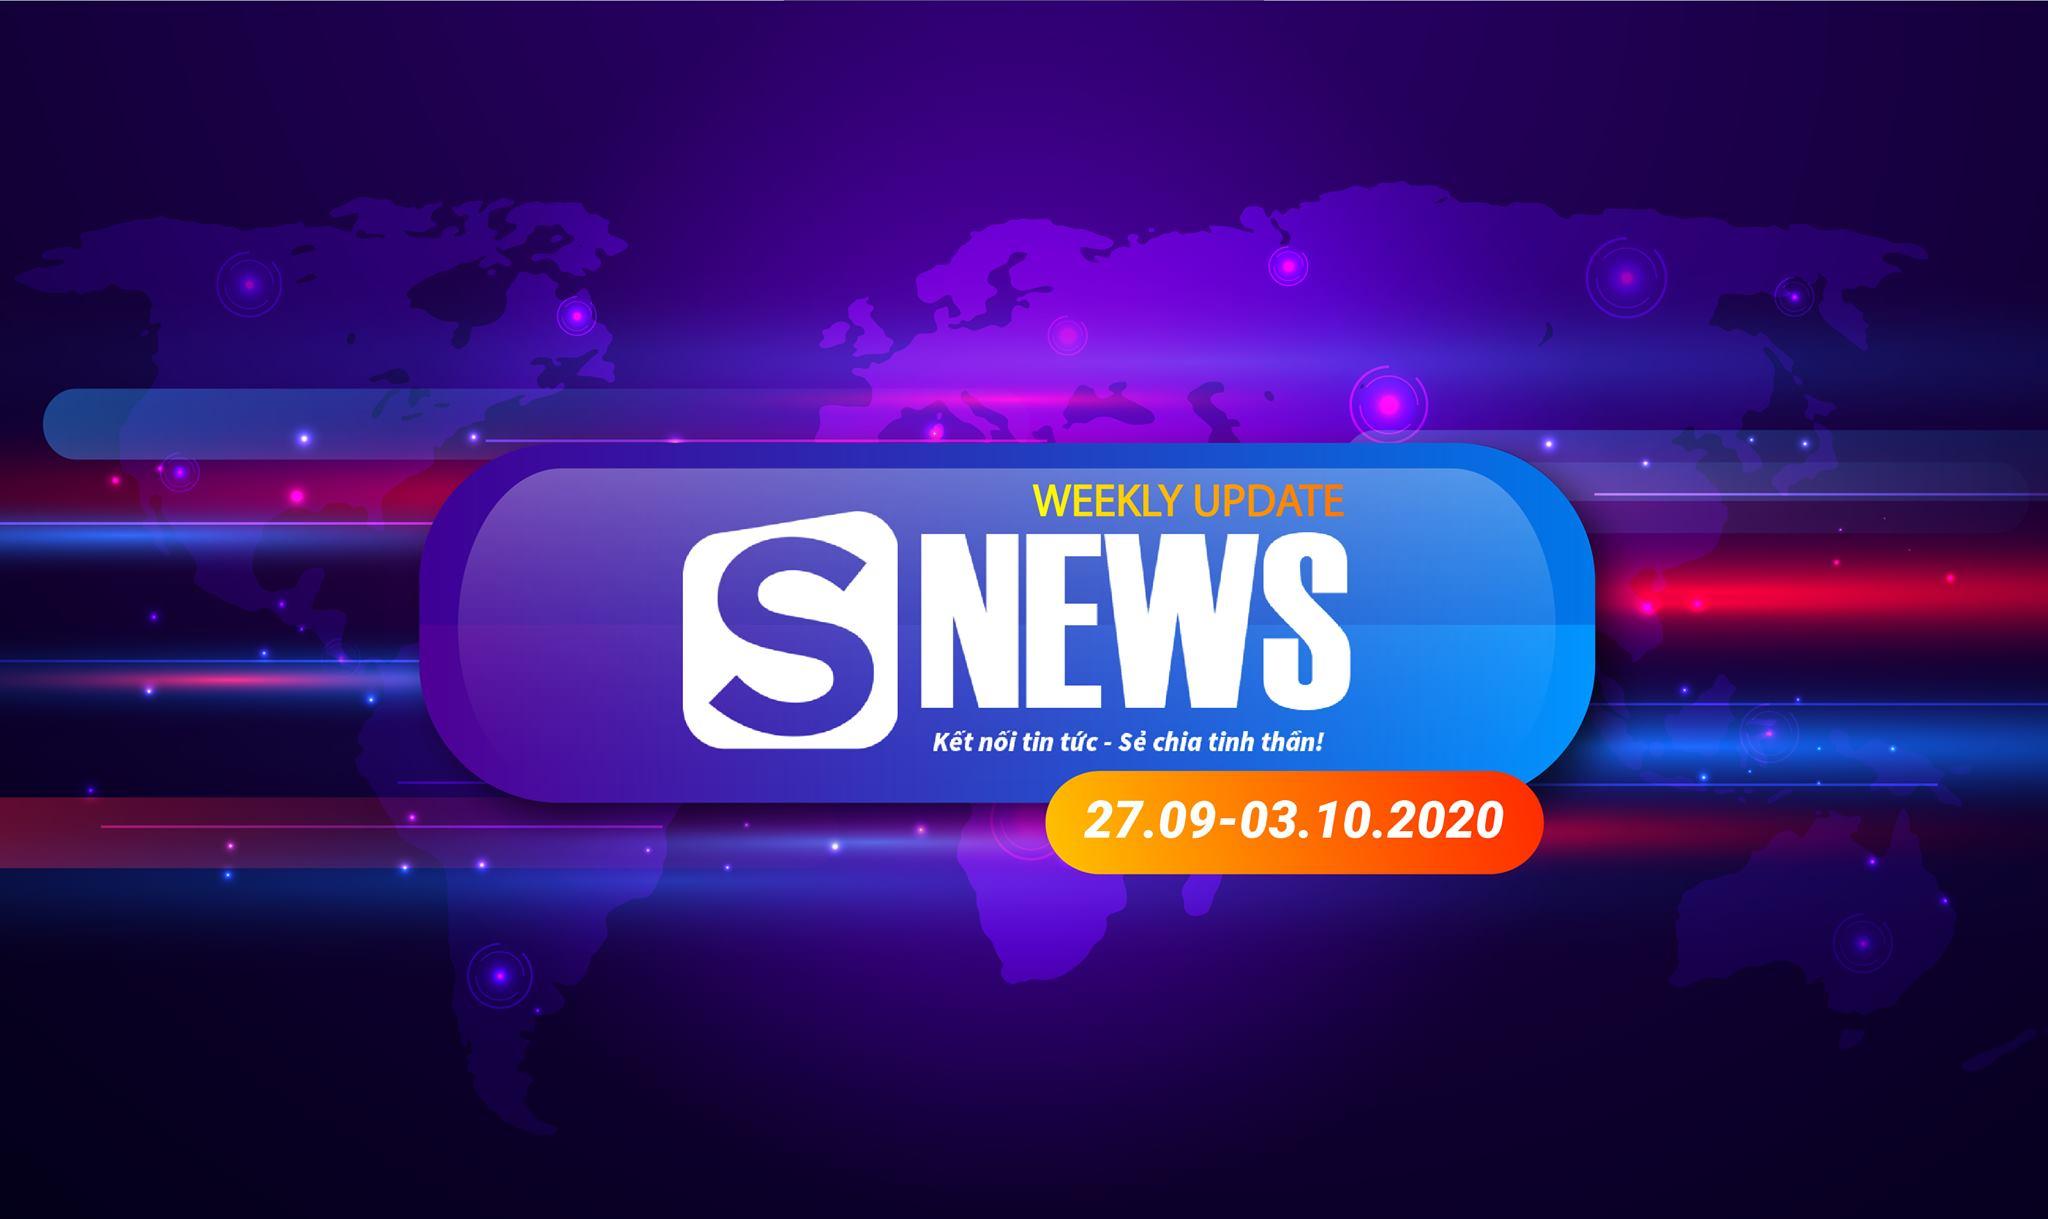 Tổng hợp tin tức Sapo tuần qua: 27.09 - 3.10